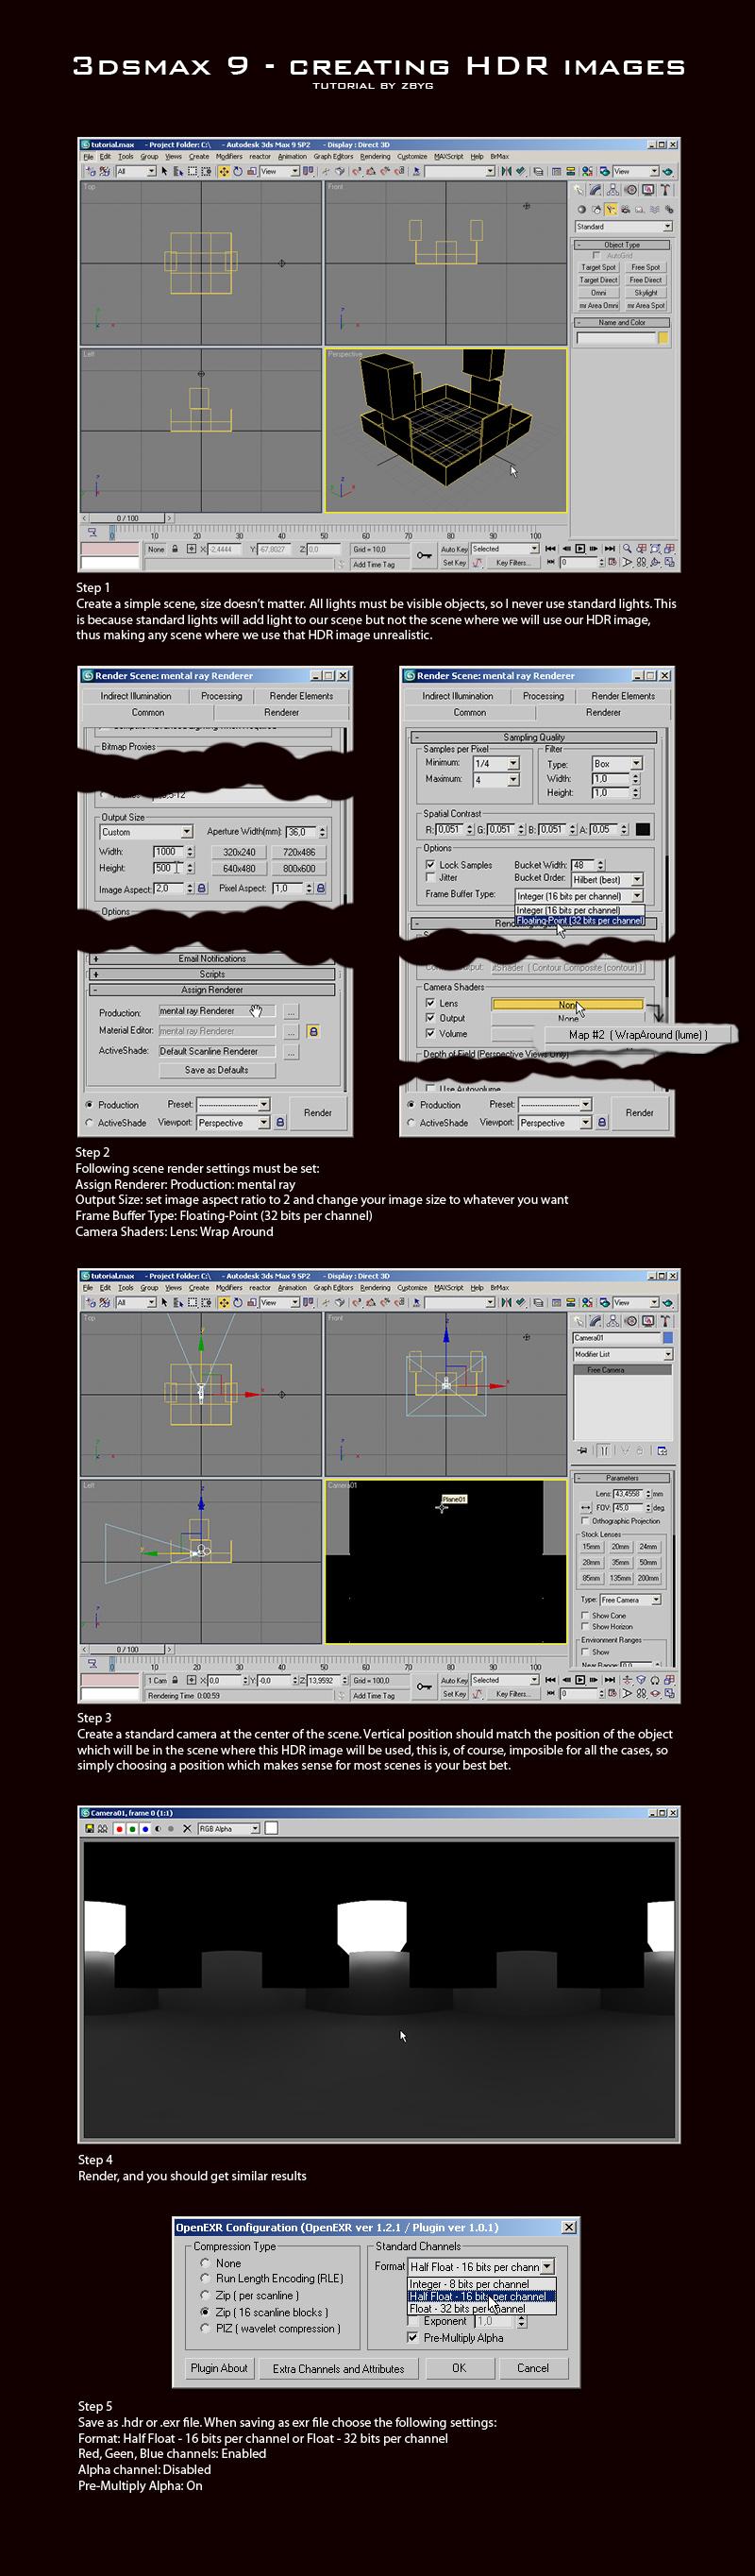 HDRi tutorial by zbyg